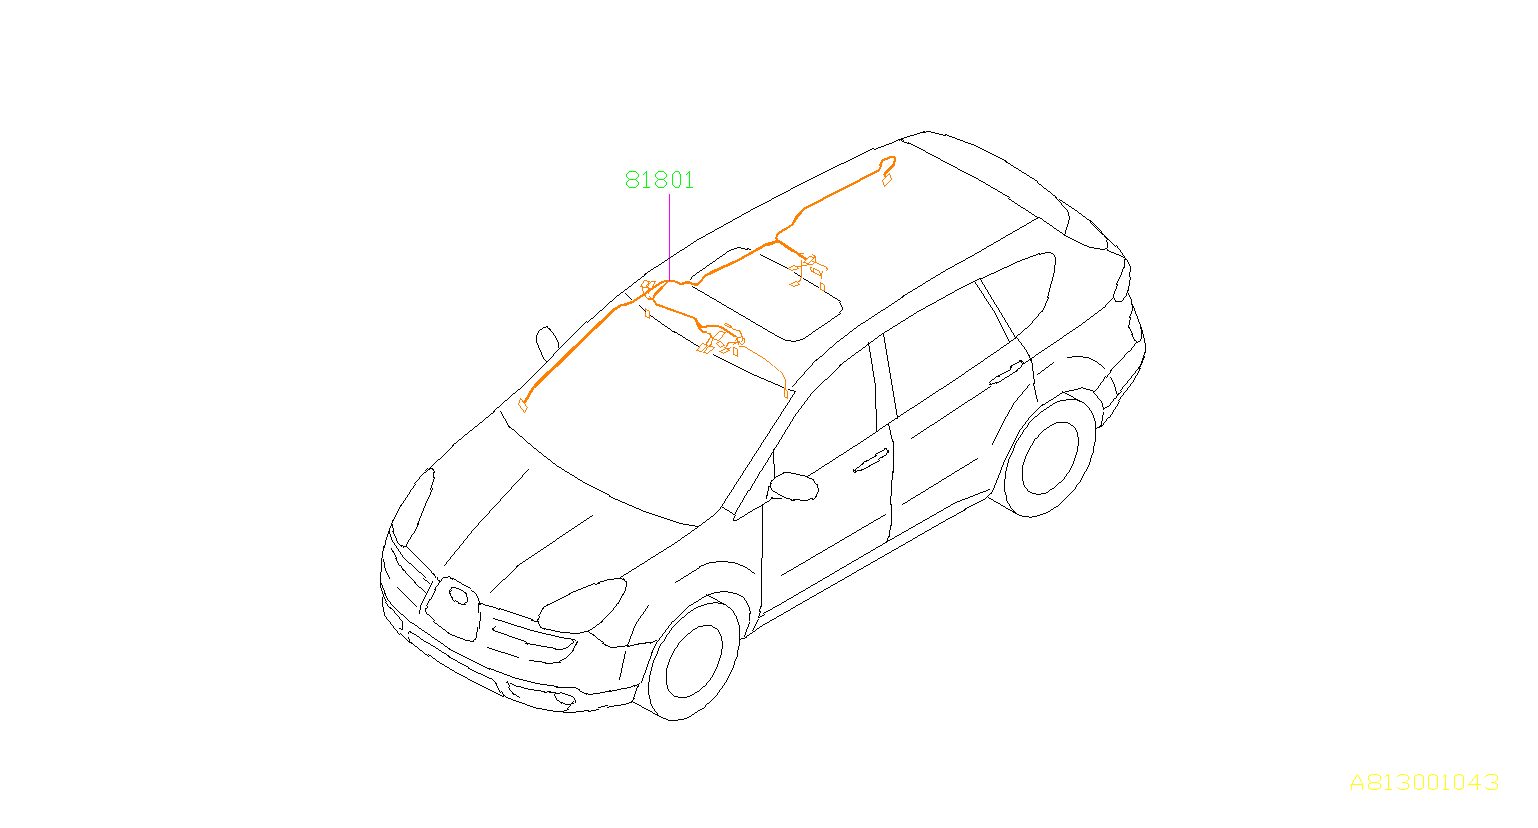 Subaru Tribeca Sunroof Wiring Harness Right Cord Roof